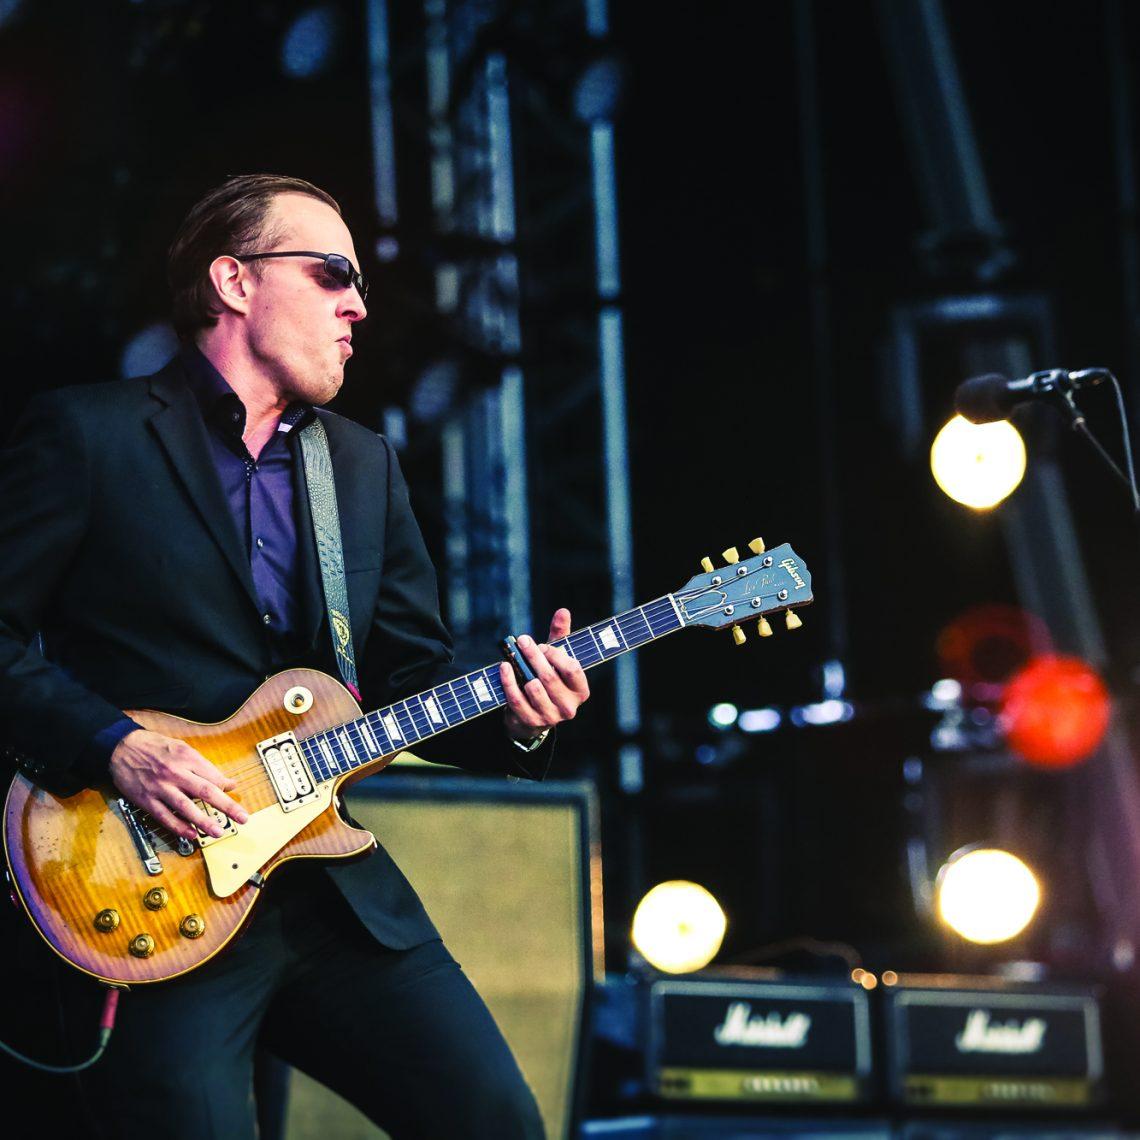 Joe Bonamassa Revels New Recording Of 'Cradle Rock' – 20th Anniversary Of His Debut Album 'A New Day Yesterday'